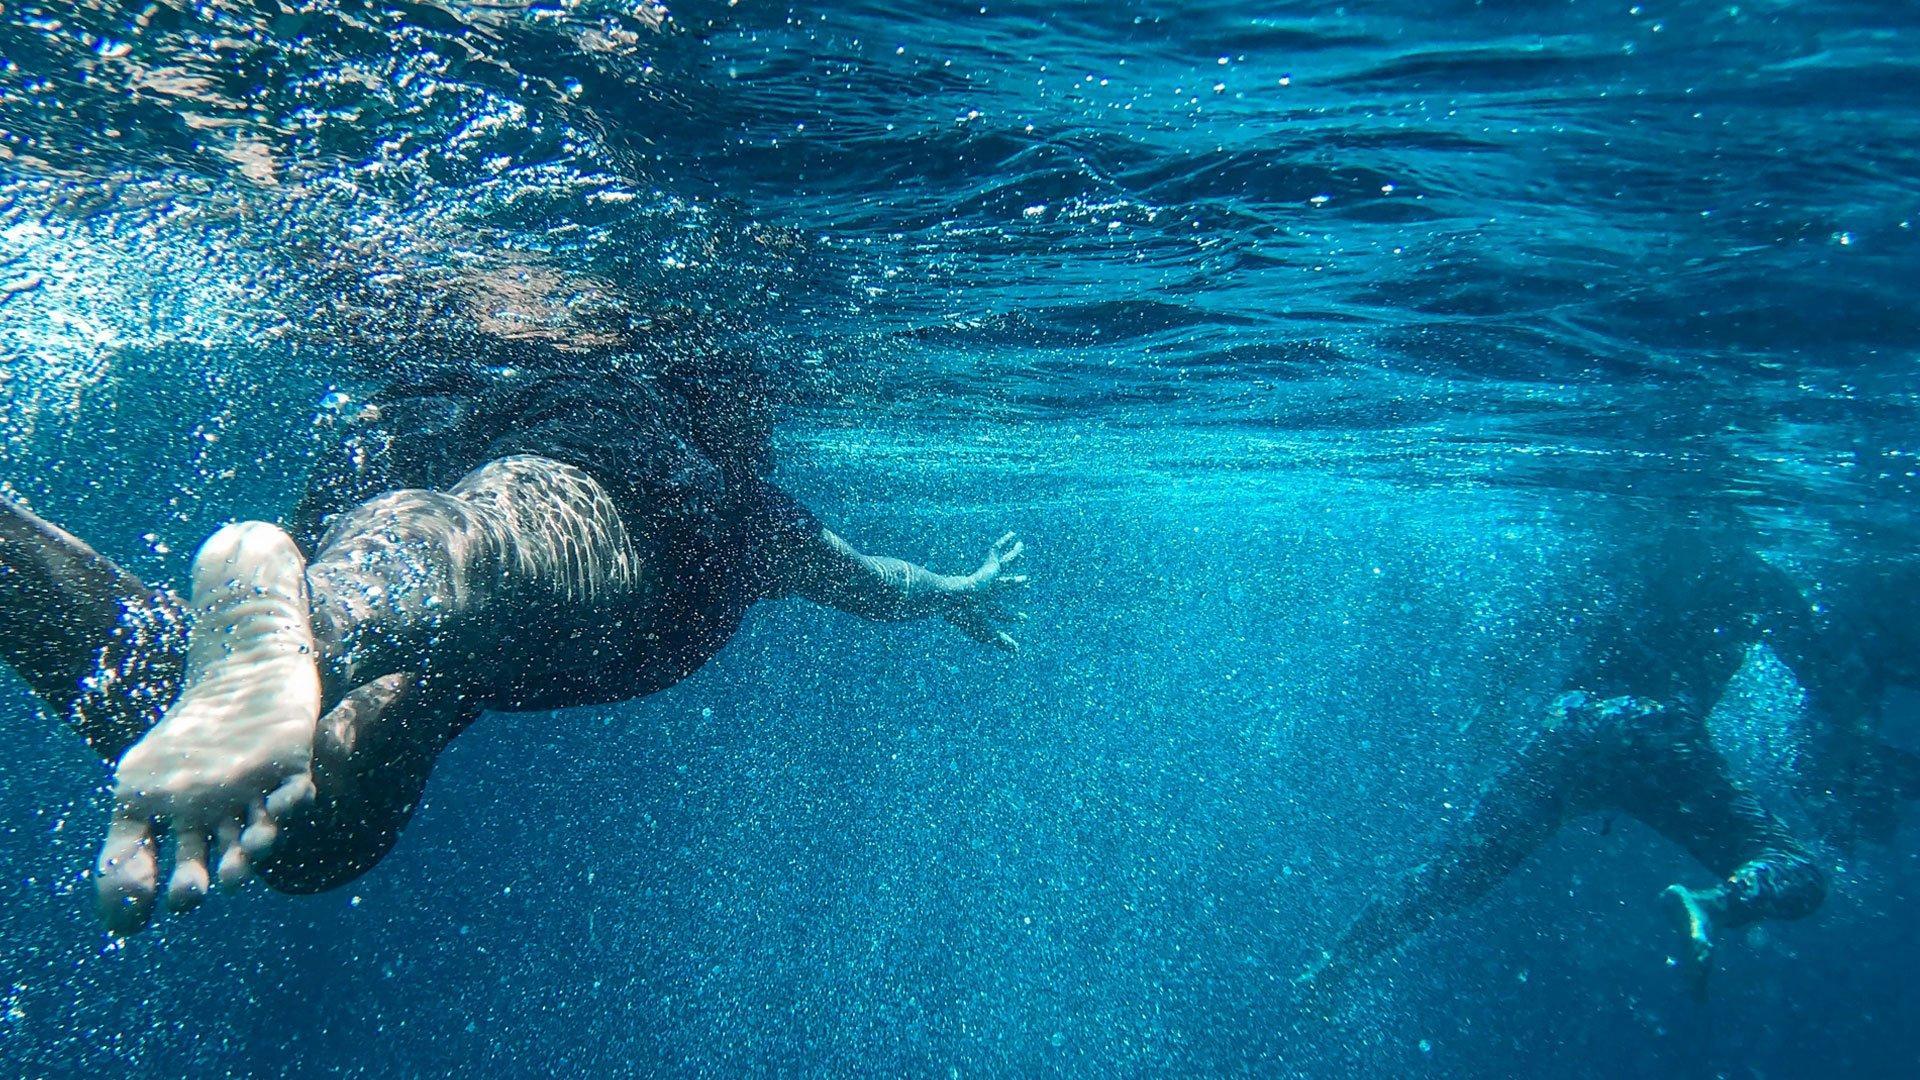 DrowningOpenWater